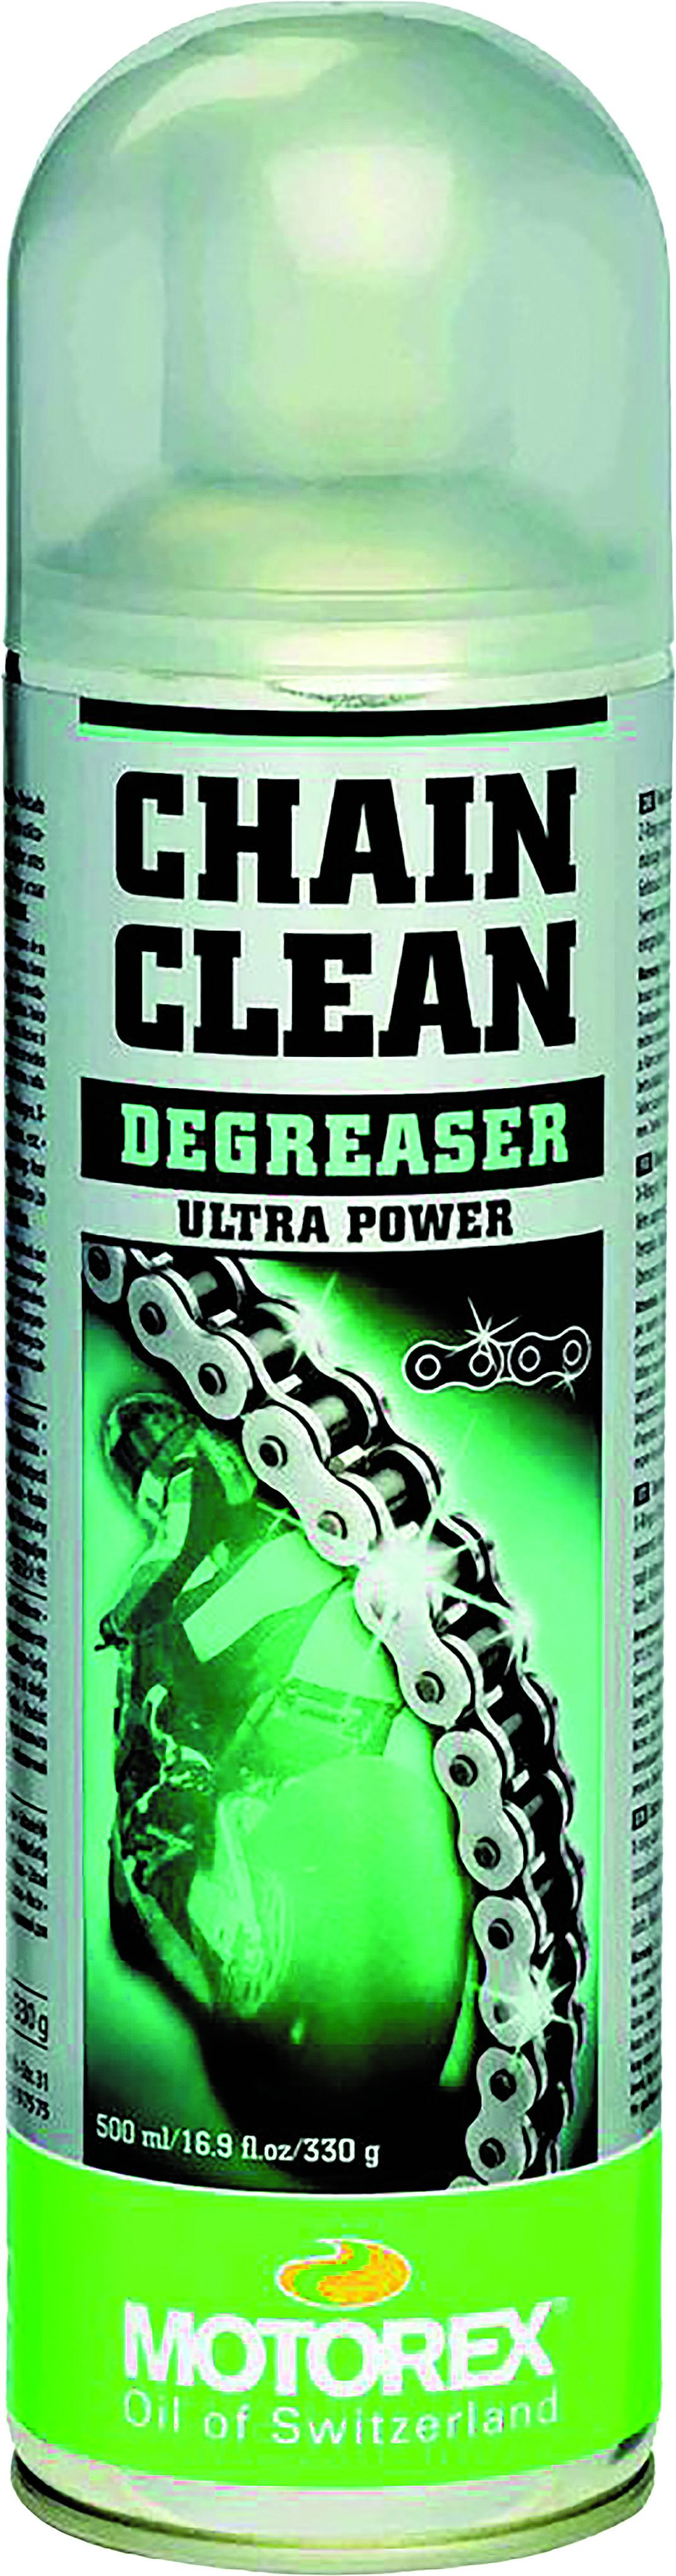 Chain Clean Degreaser 500Ml